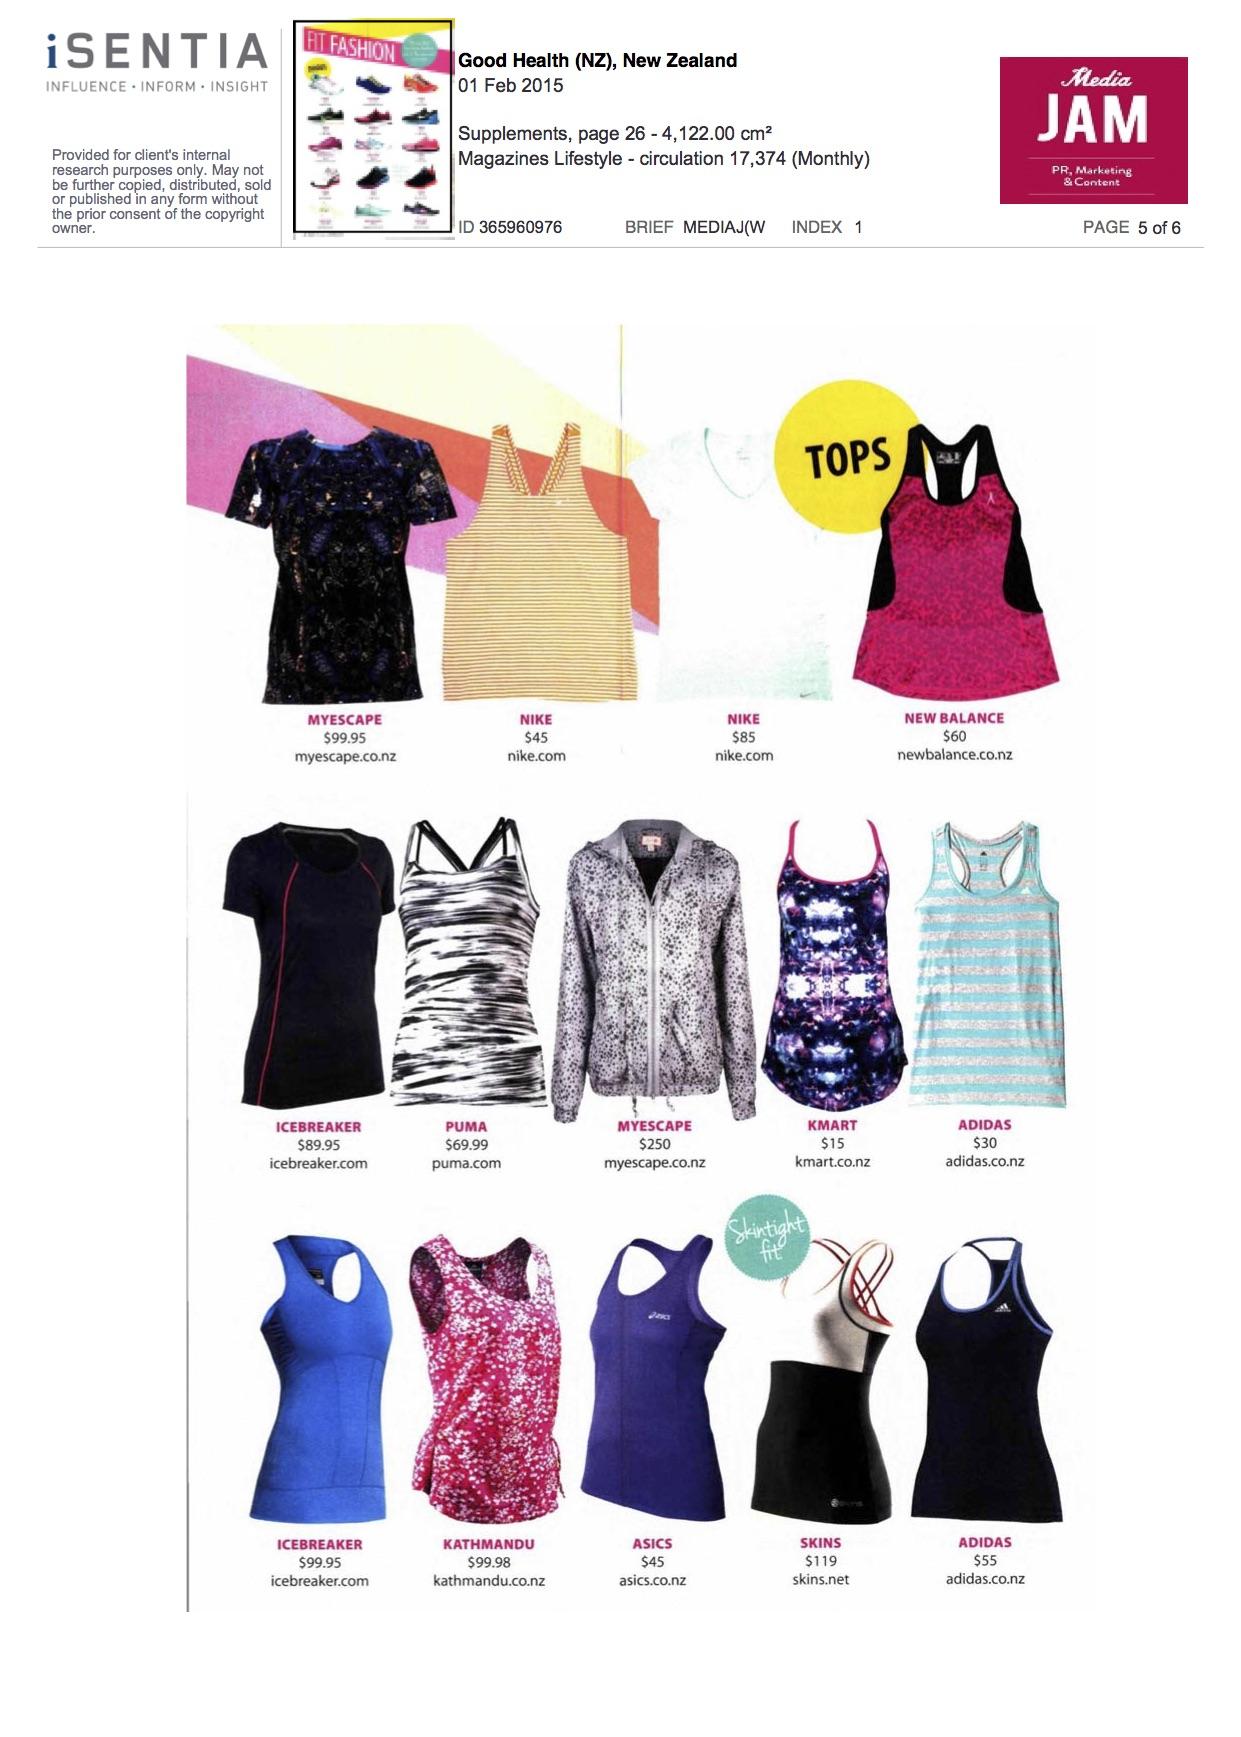 5Good Health Magazine Feb 2015 Fit Fashion Featuring New Balance.jpg